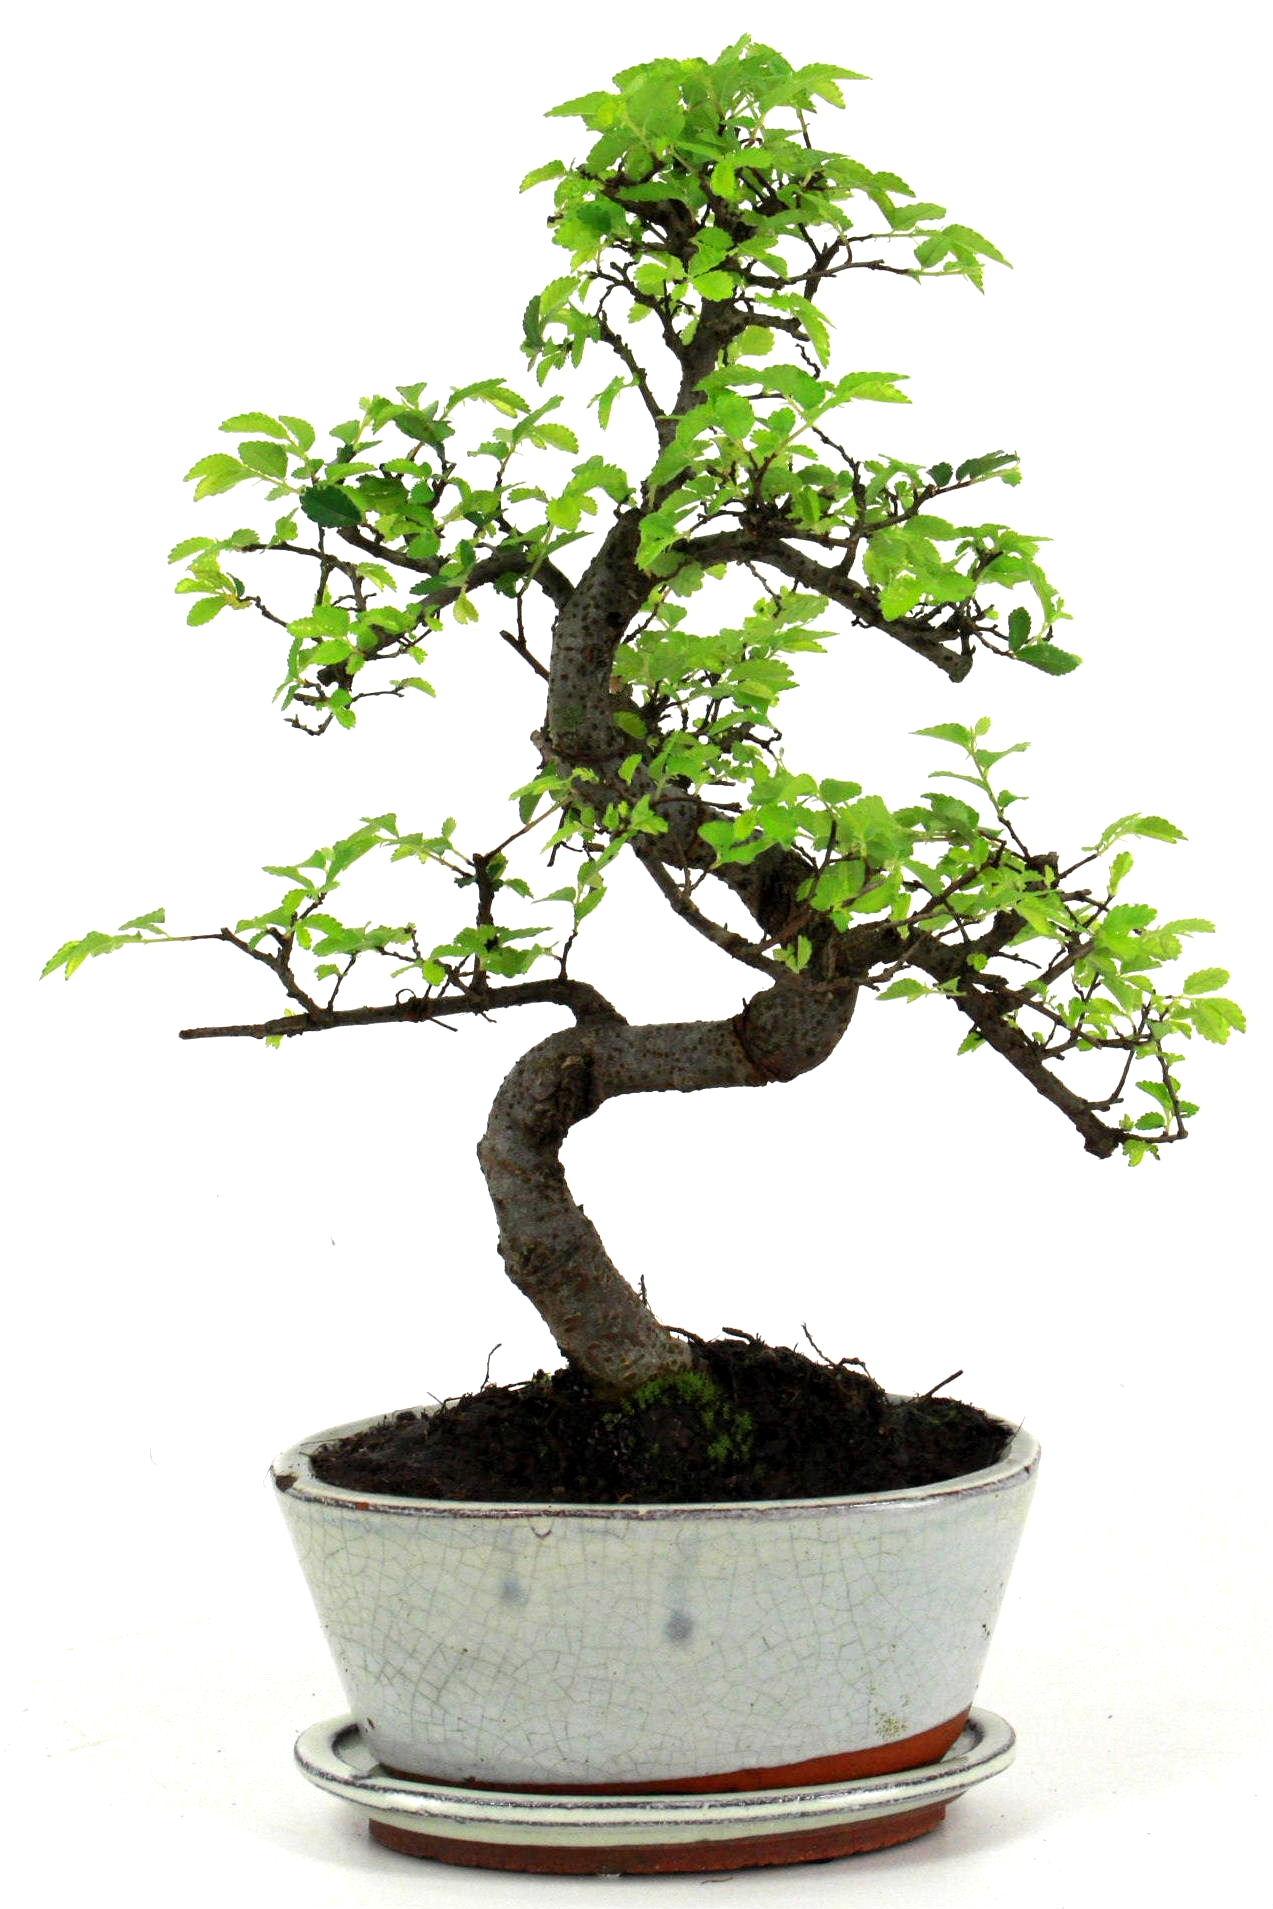 Chinesische ulme bonsai 35 cm 1715 bei oyaki bonsai kaufen for Bonsai onlineshop